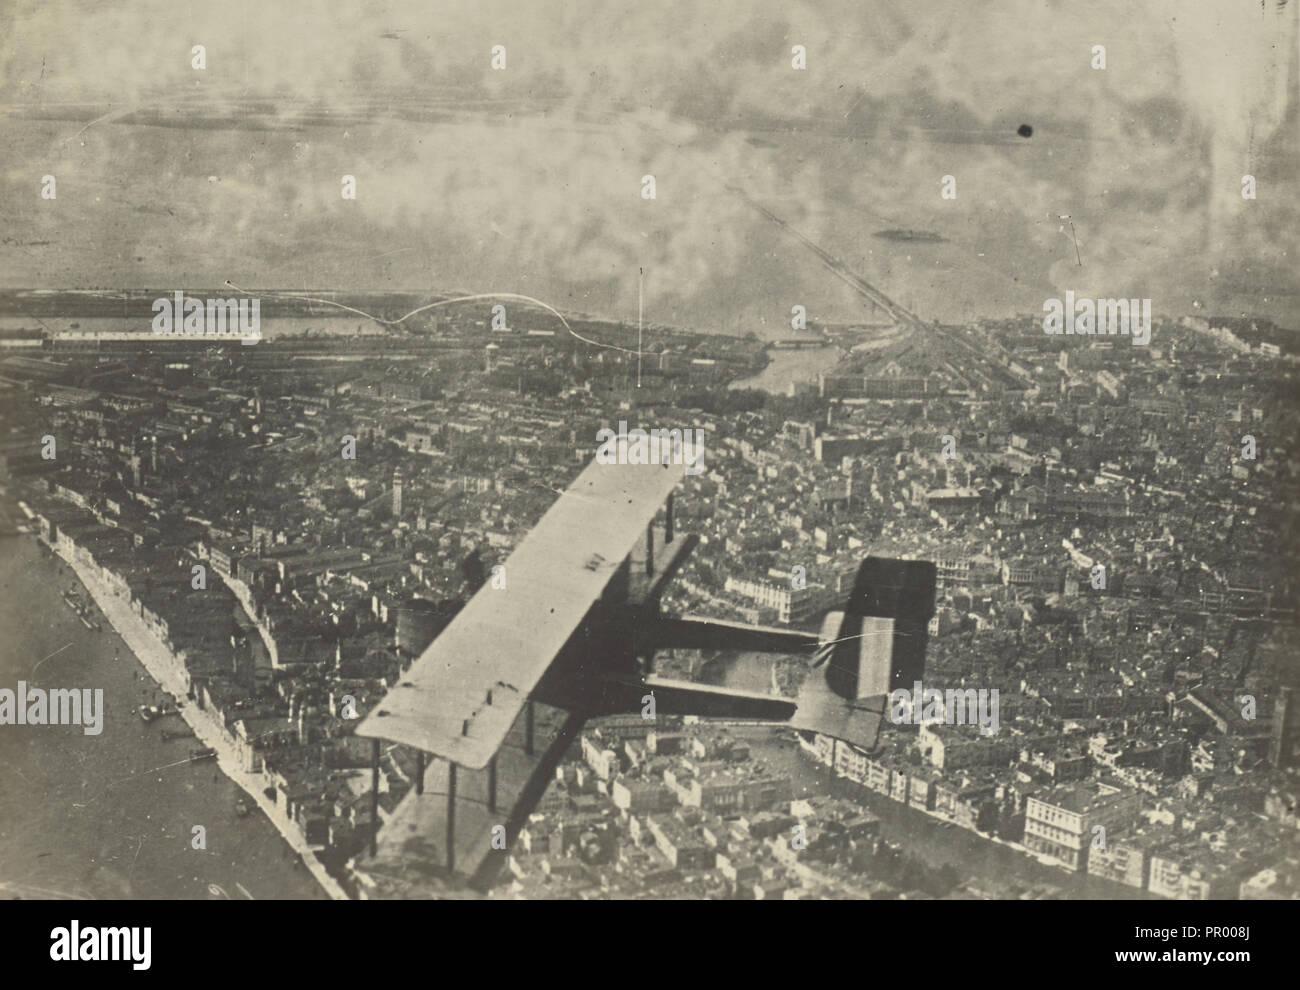 Aerial shot of an airplane over Venice; Fédèle Azari, Italian, 1895 - 1930, Italy; 1914 - 1929; Gelatin silver print - Stock Image